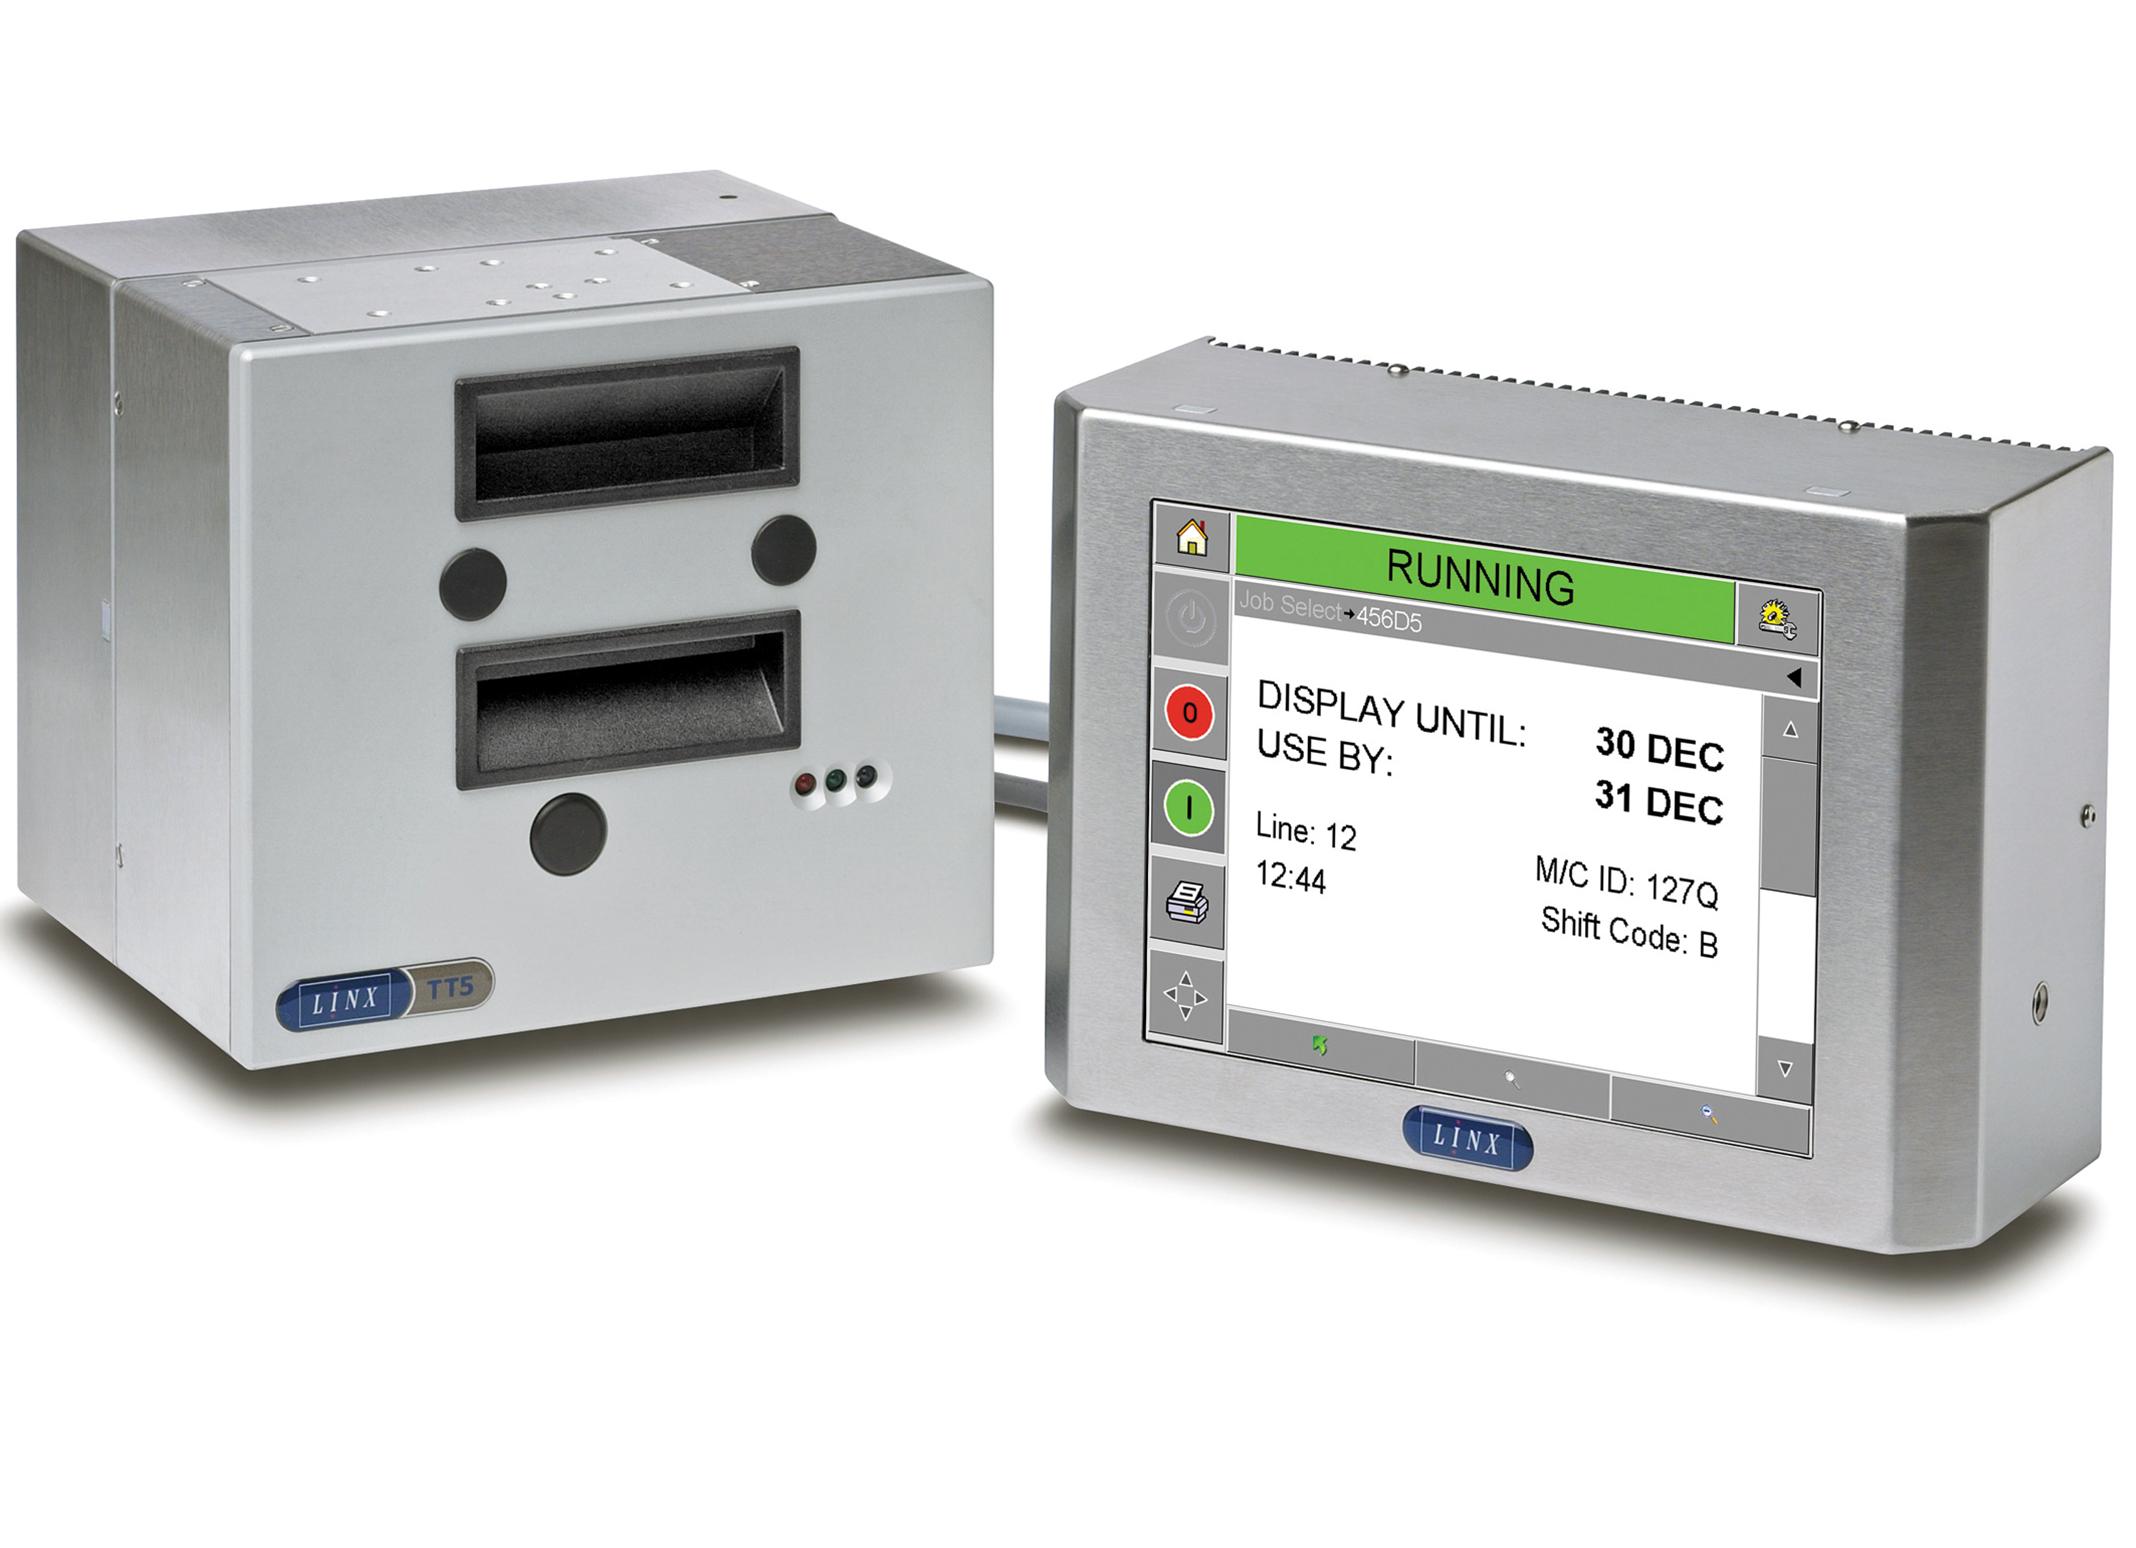 Impresora por transferencia térmica: LINX TT10